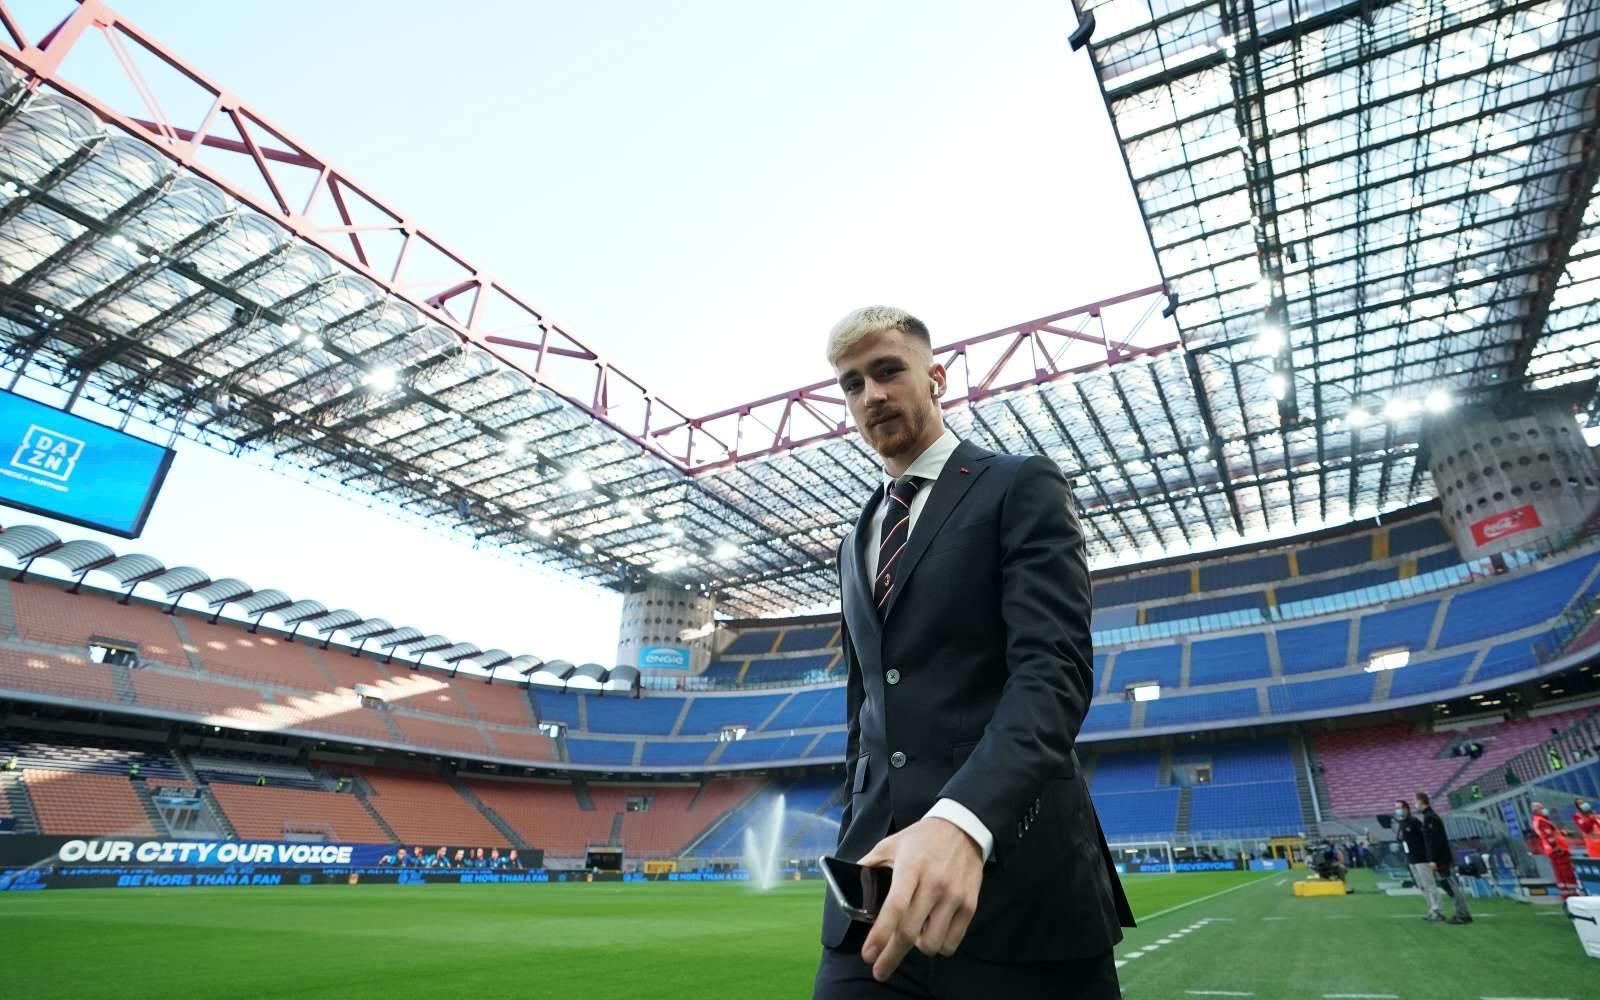 Салемакерс: «Чувствую себя в «Милане» как дома»